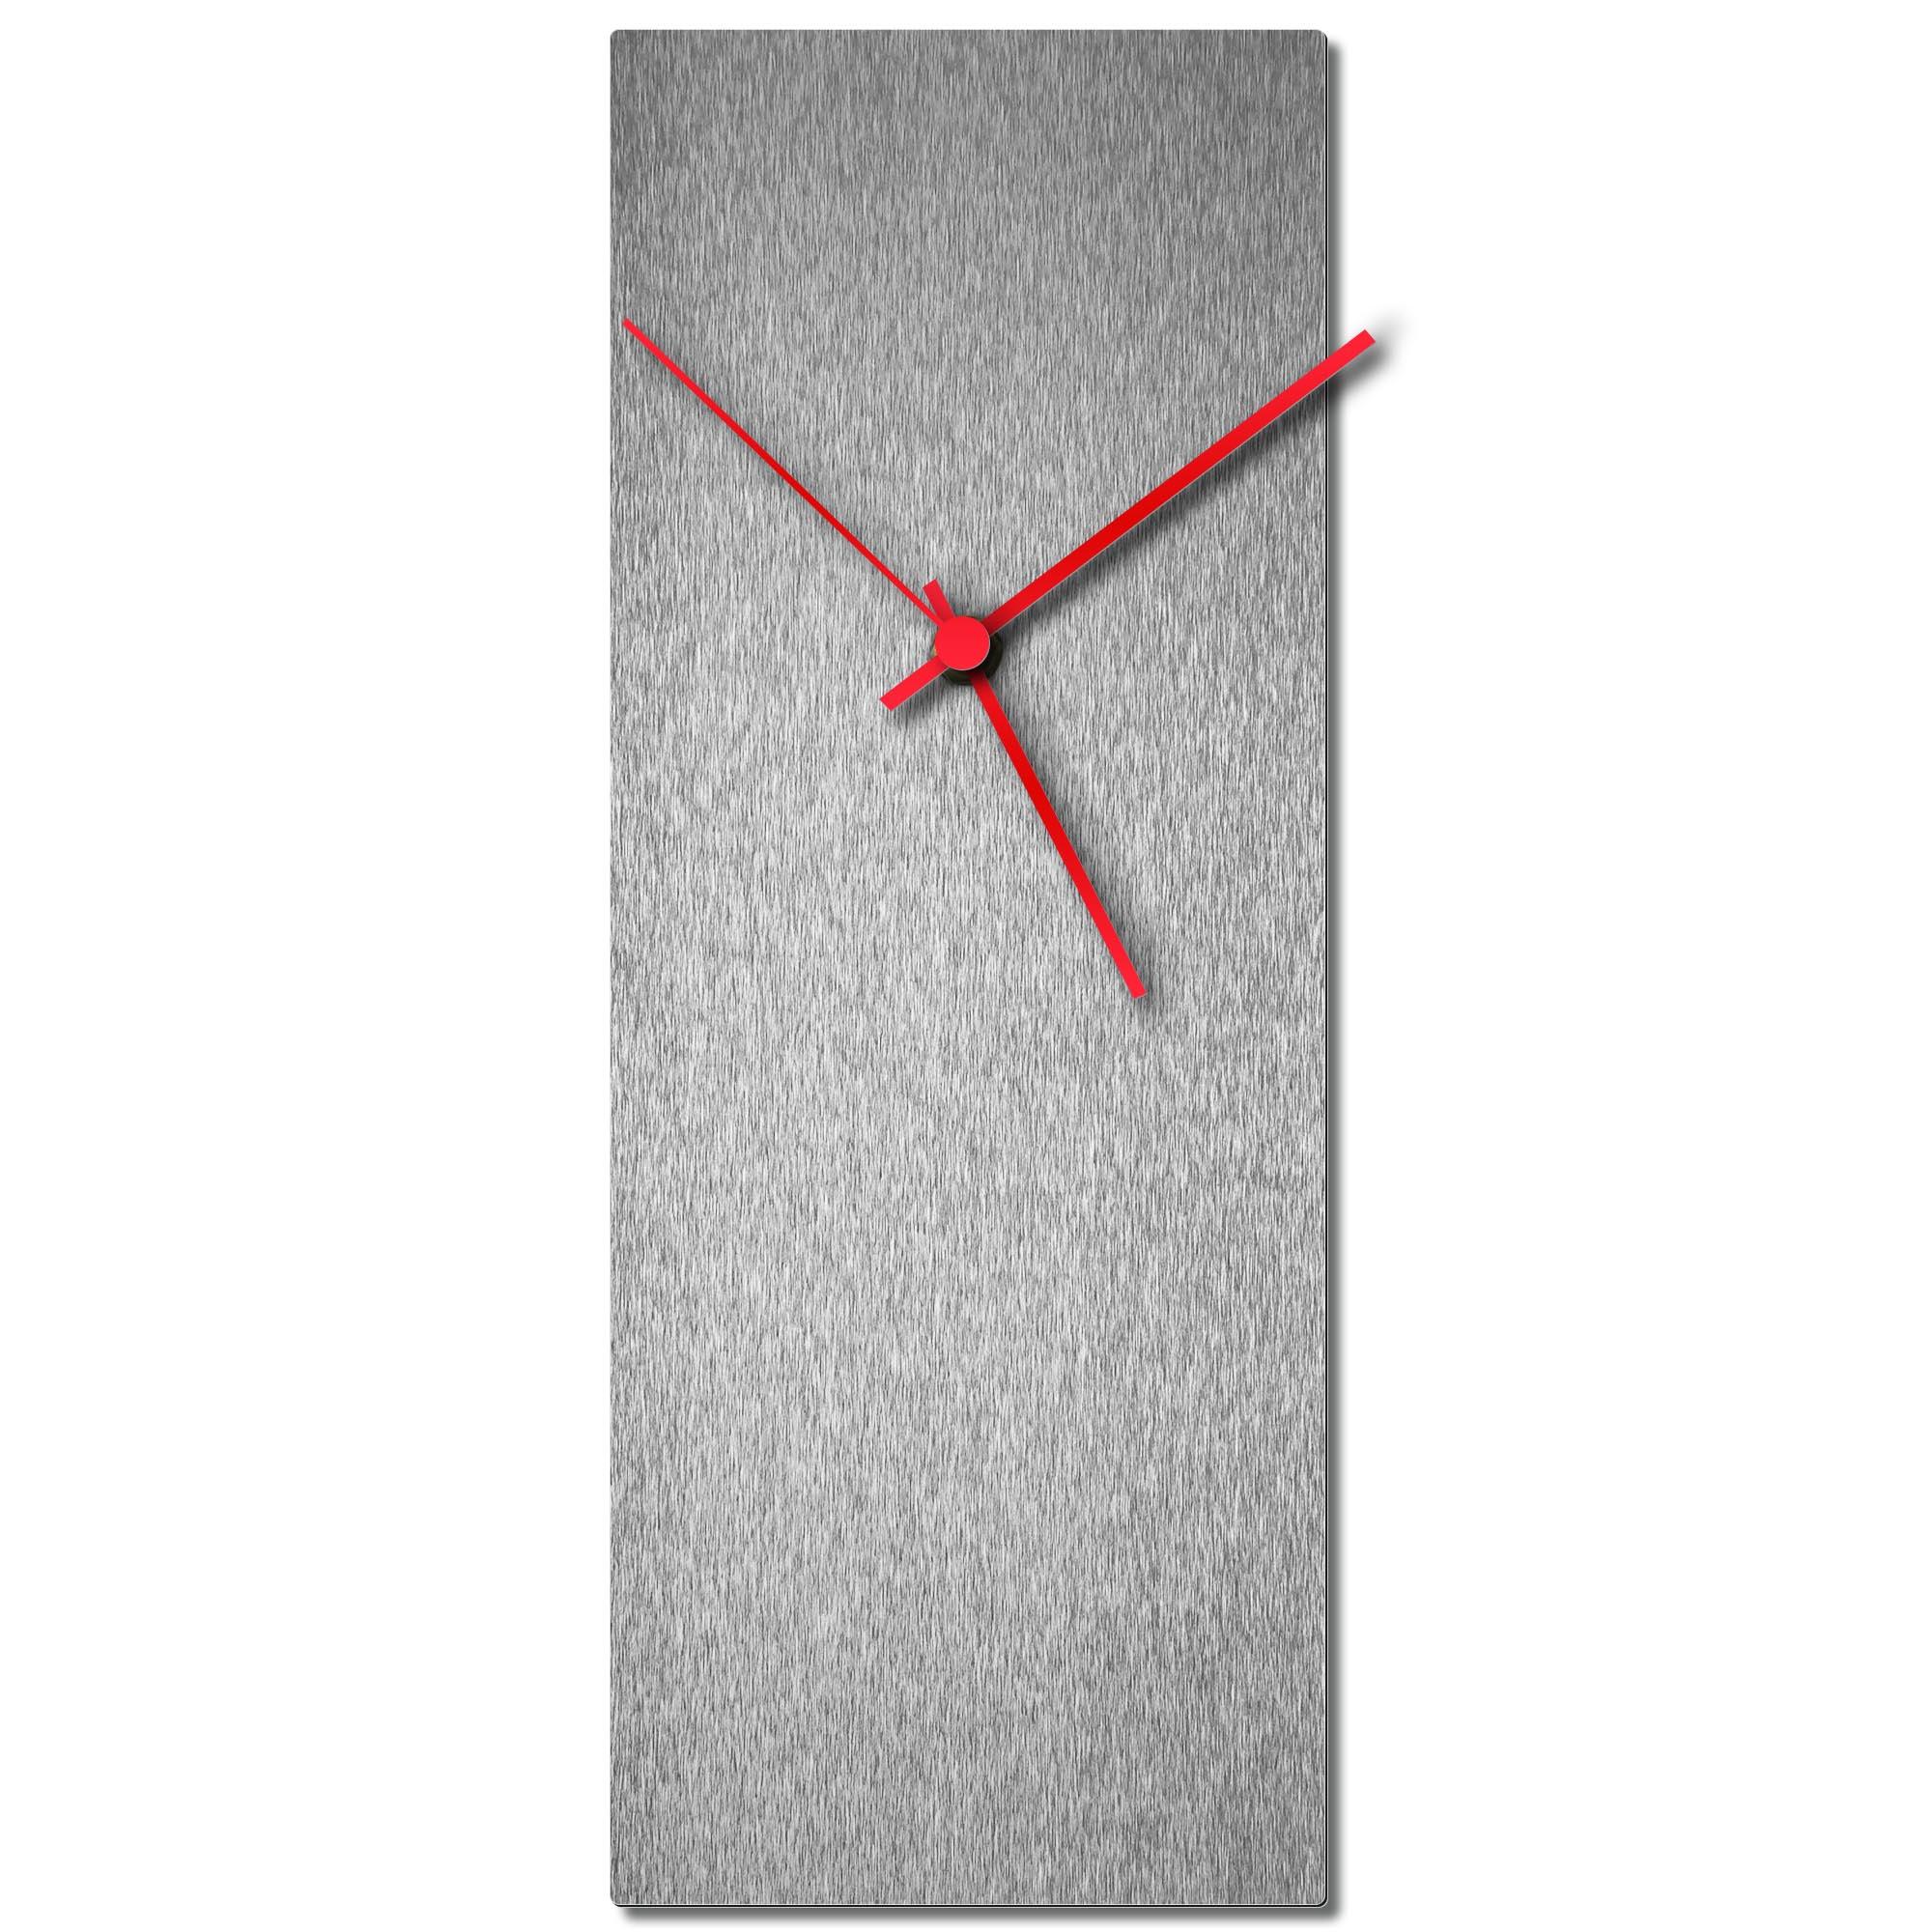 Adam Schwoeppe 'Silversmith Clock Red' Midcentury Modern Style Wall Clock